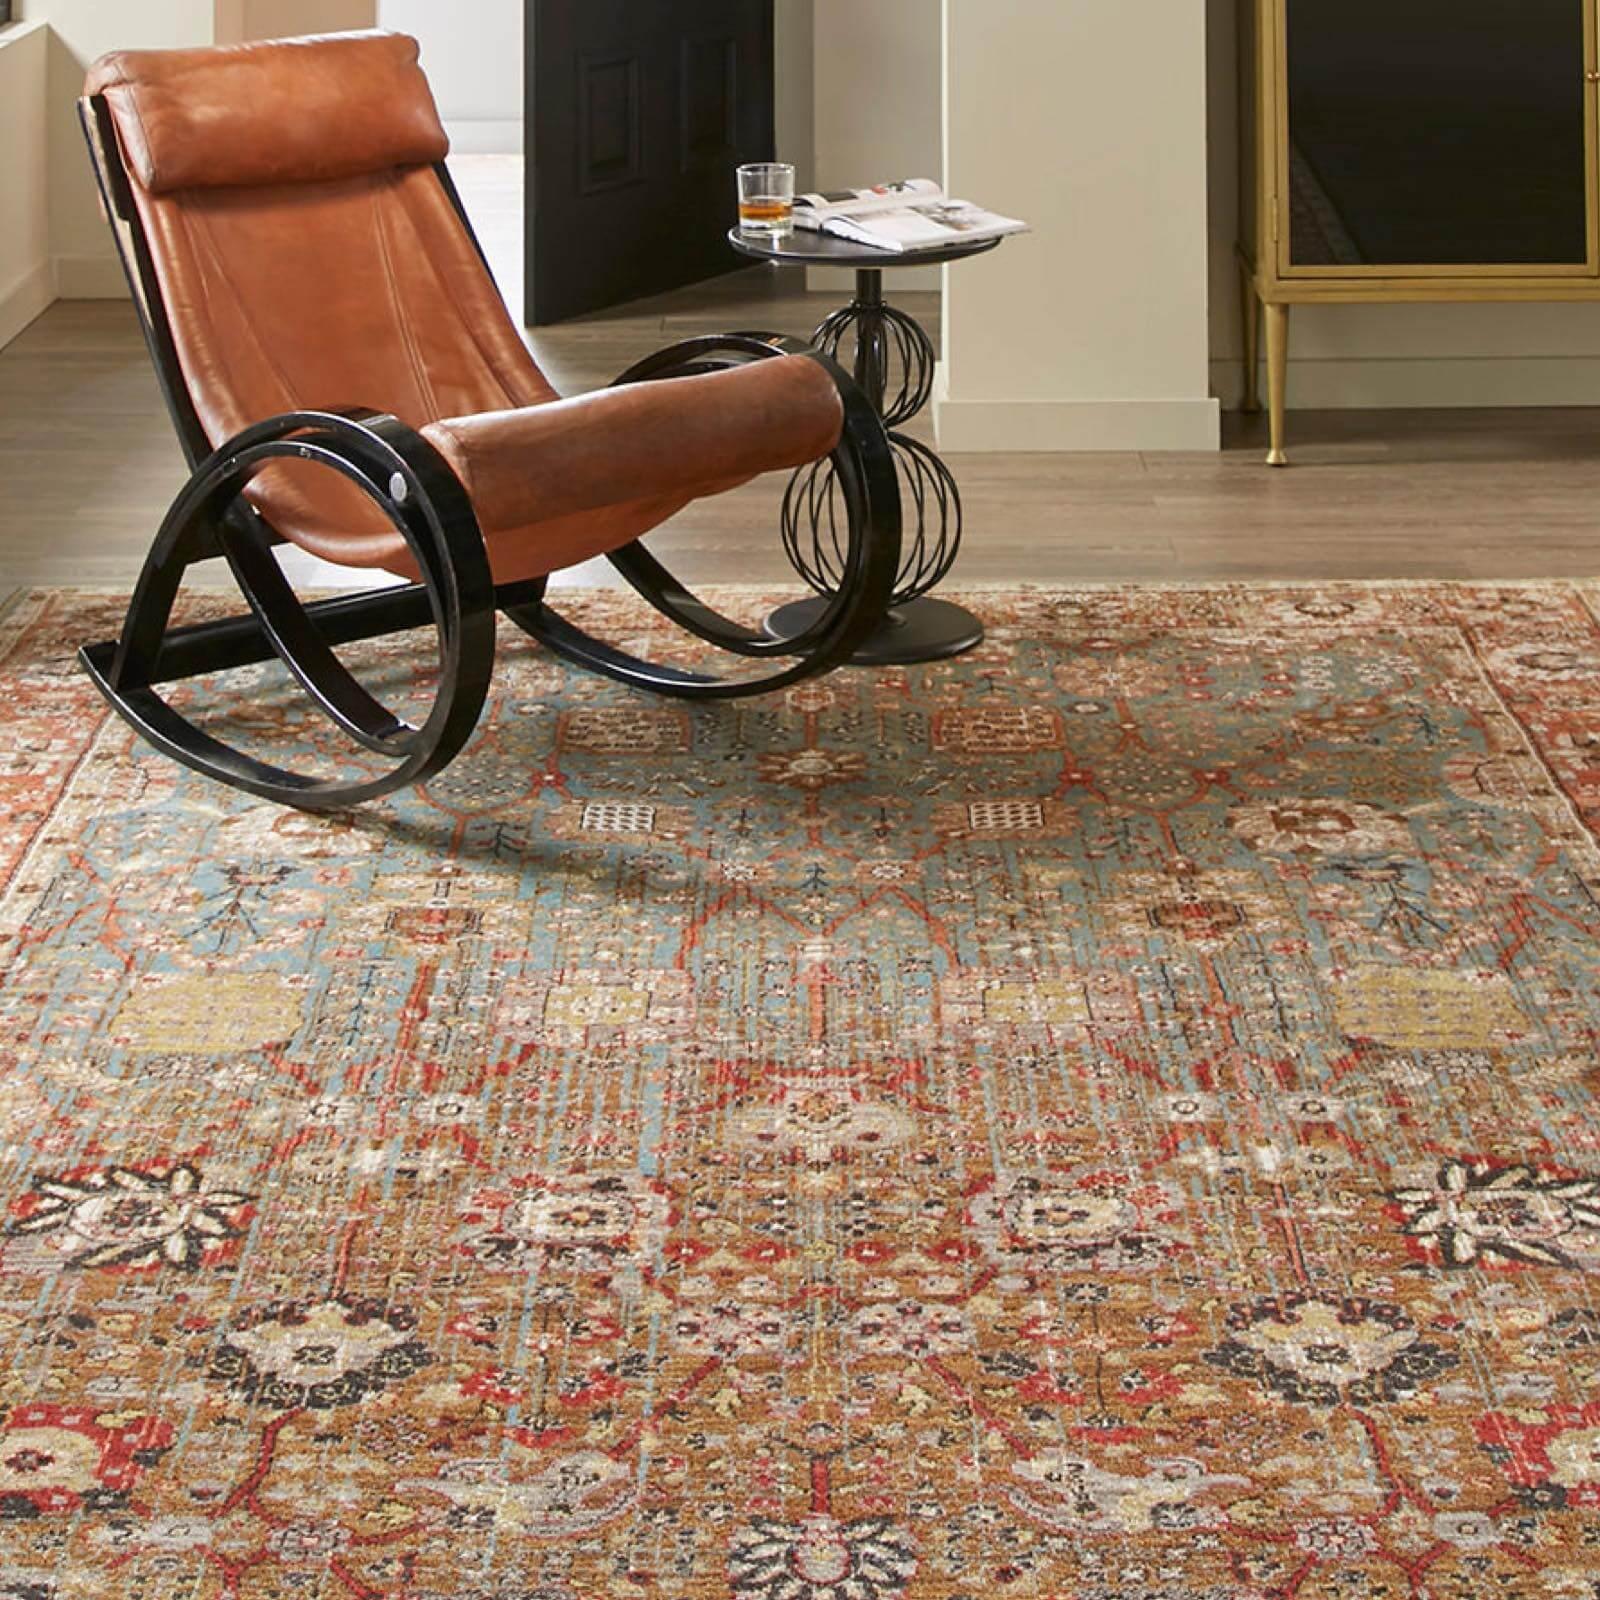 Area rug design   The Carpet Factory Super Store